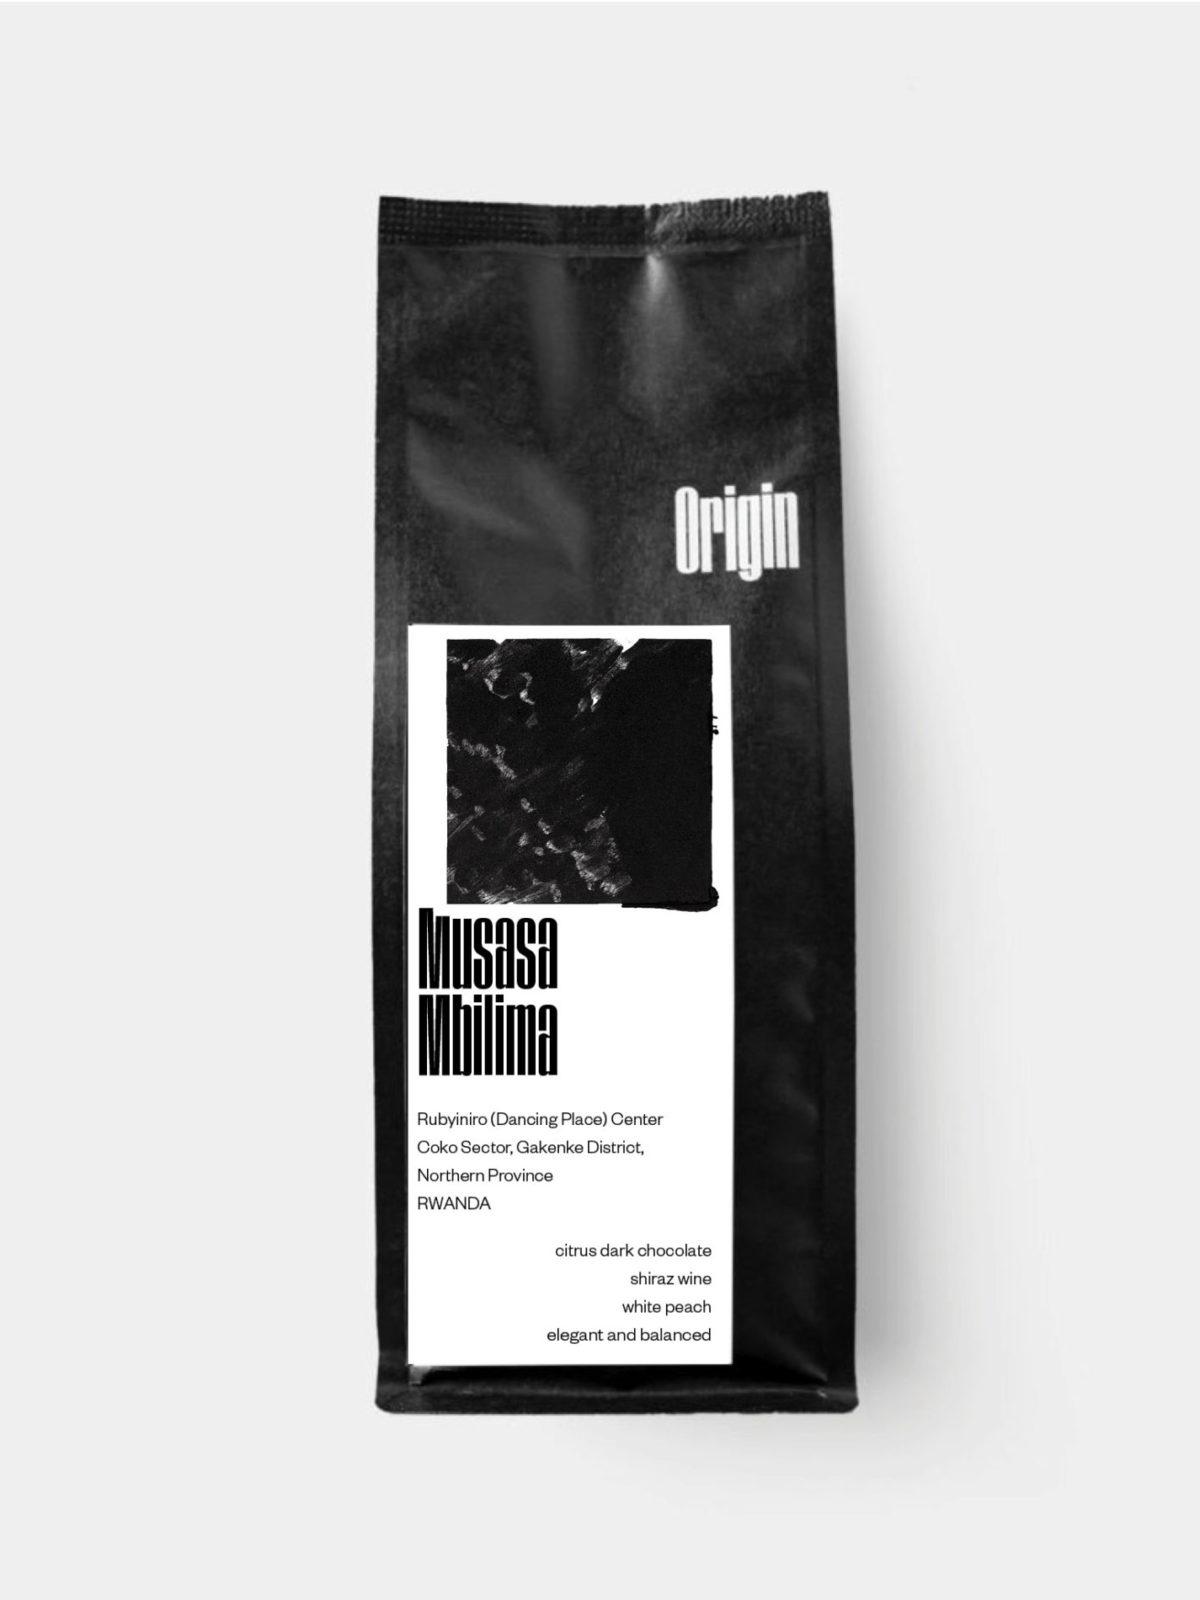 Rwanda Musasa Mbilima 2021 - on the 250g bag